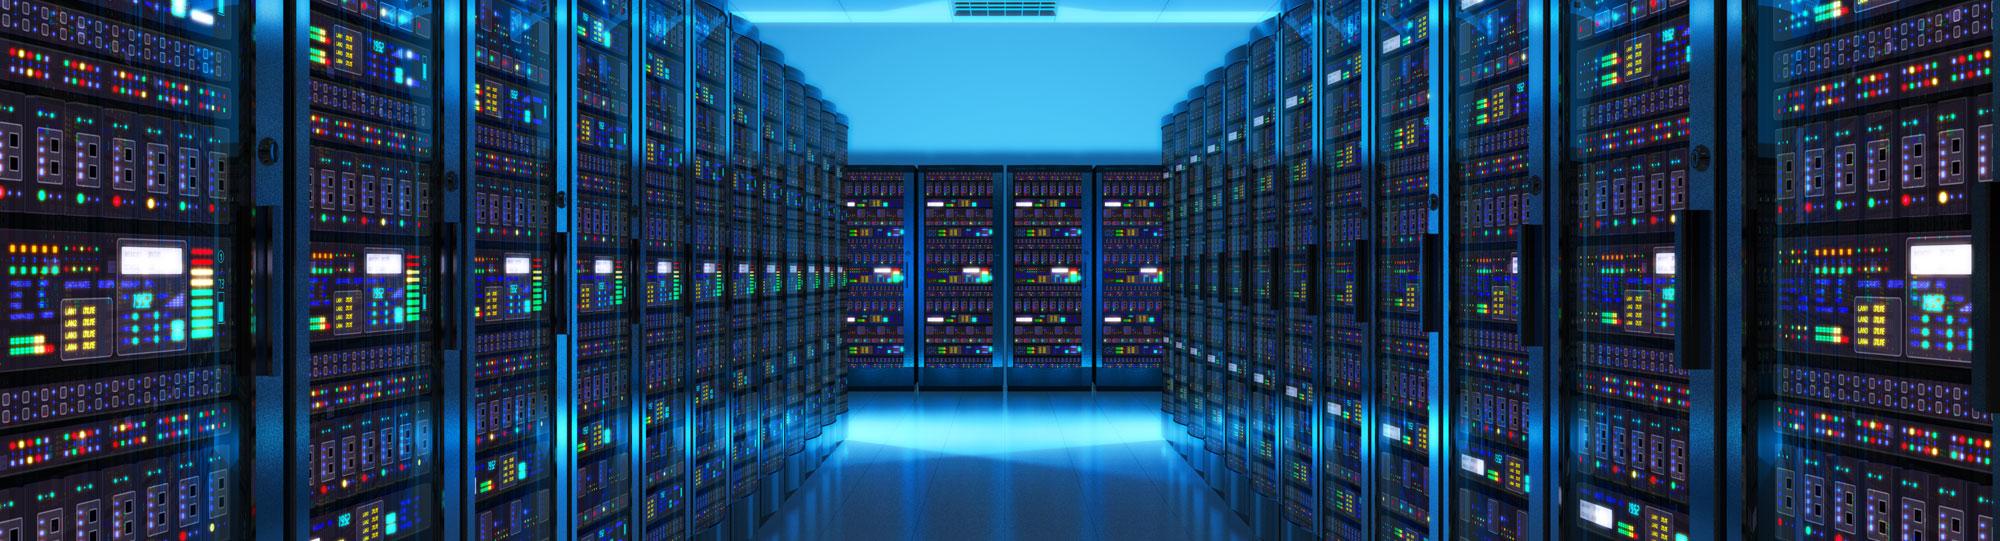 Server room with blue lighting